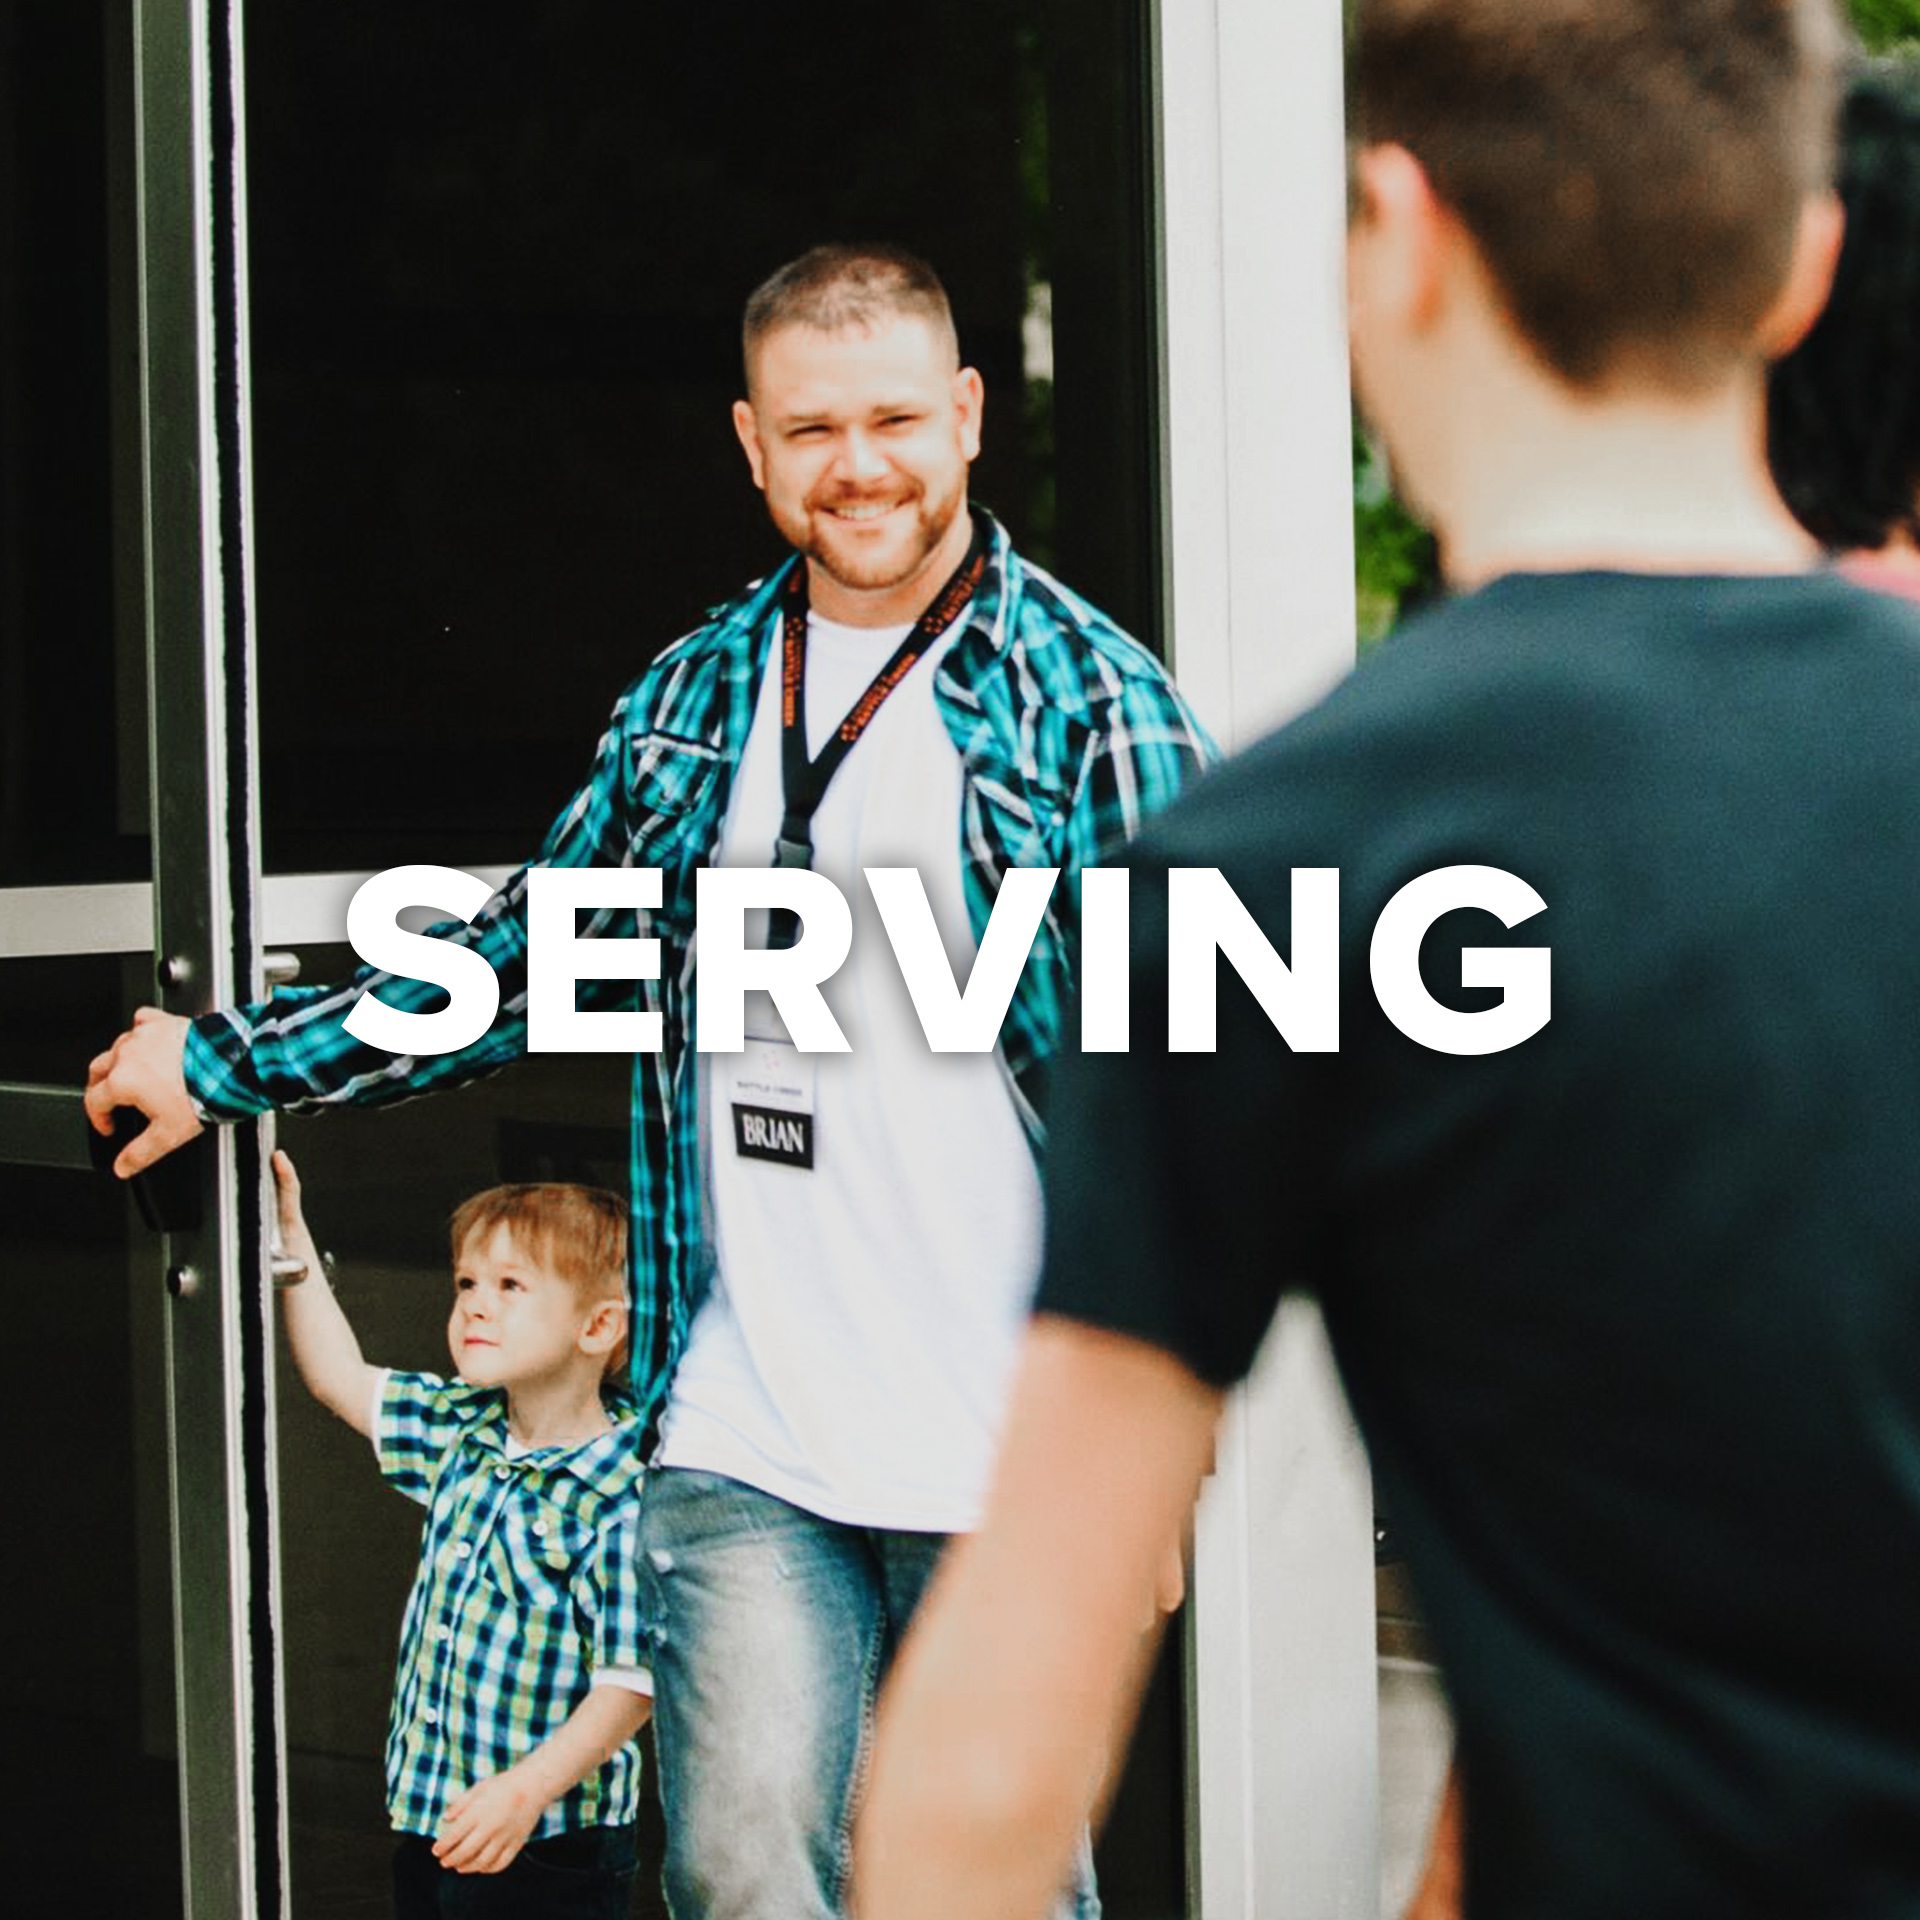 Serving.jpg